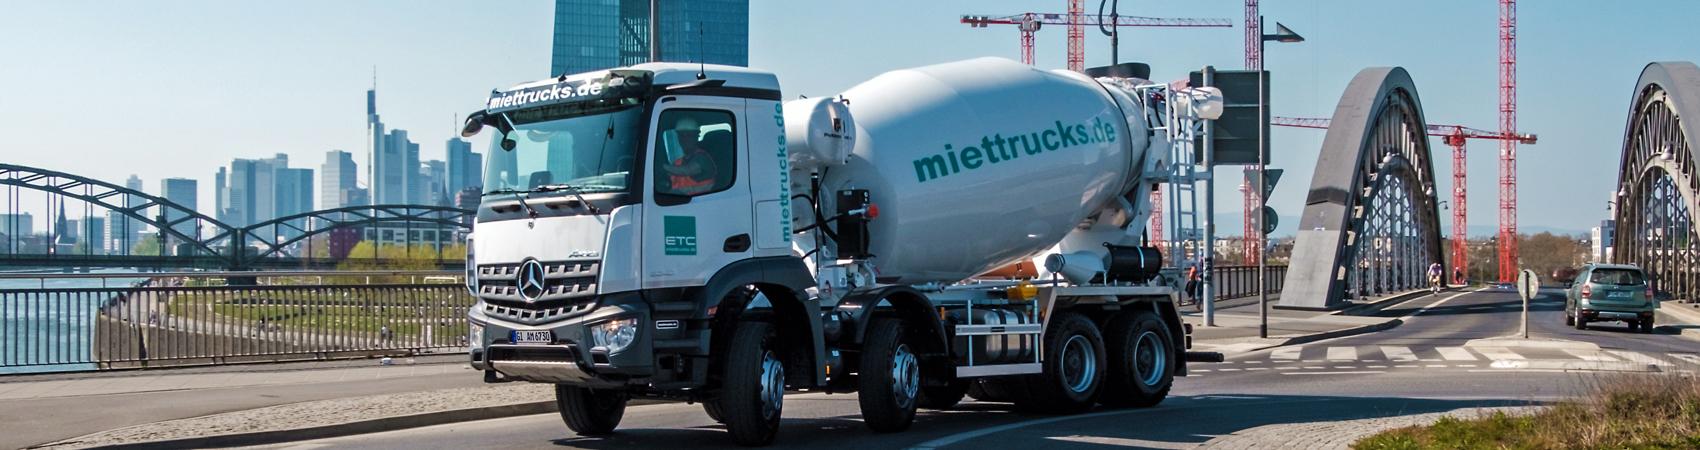 Putzmeister Truck Mixer